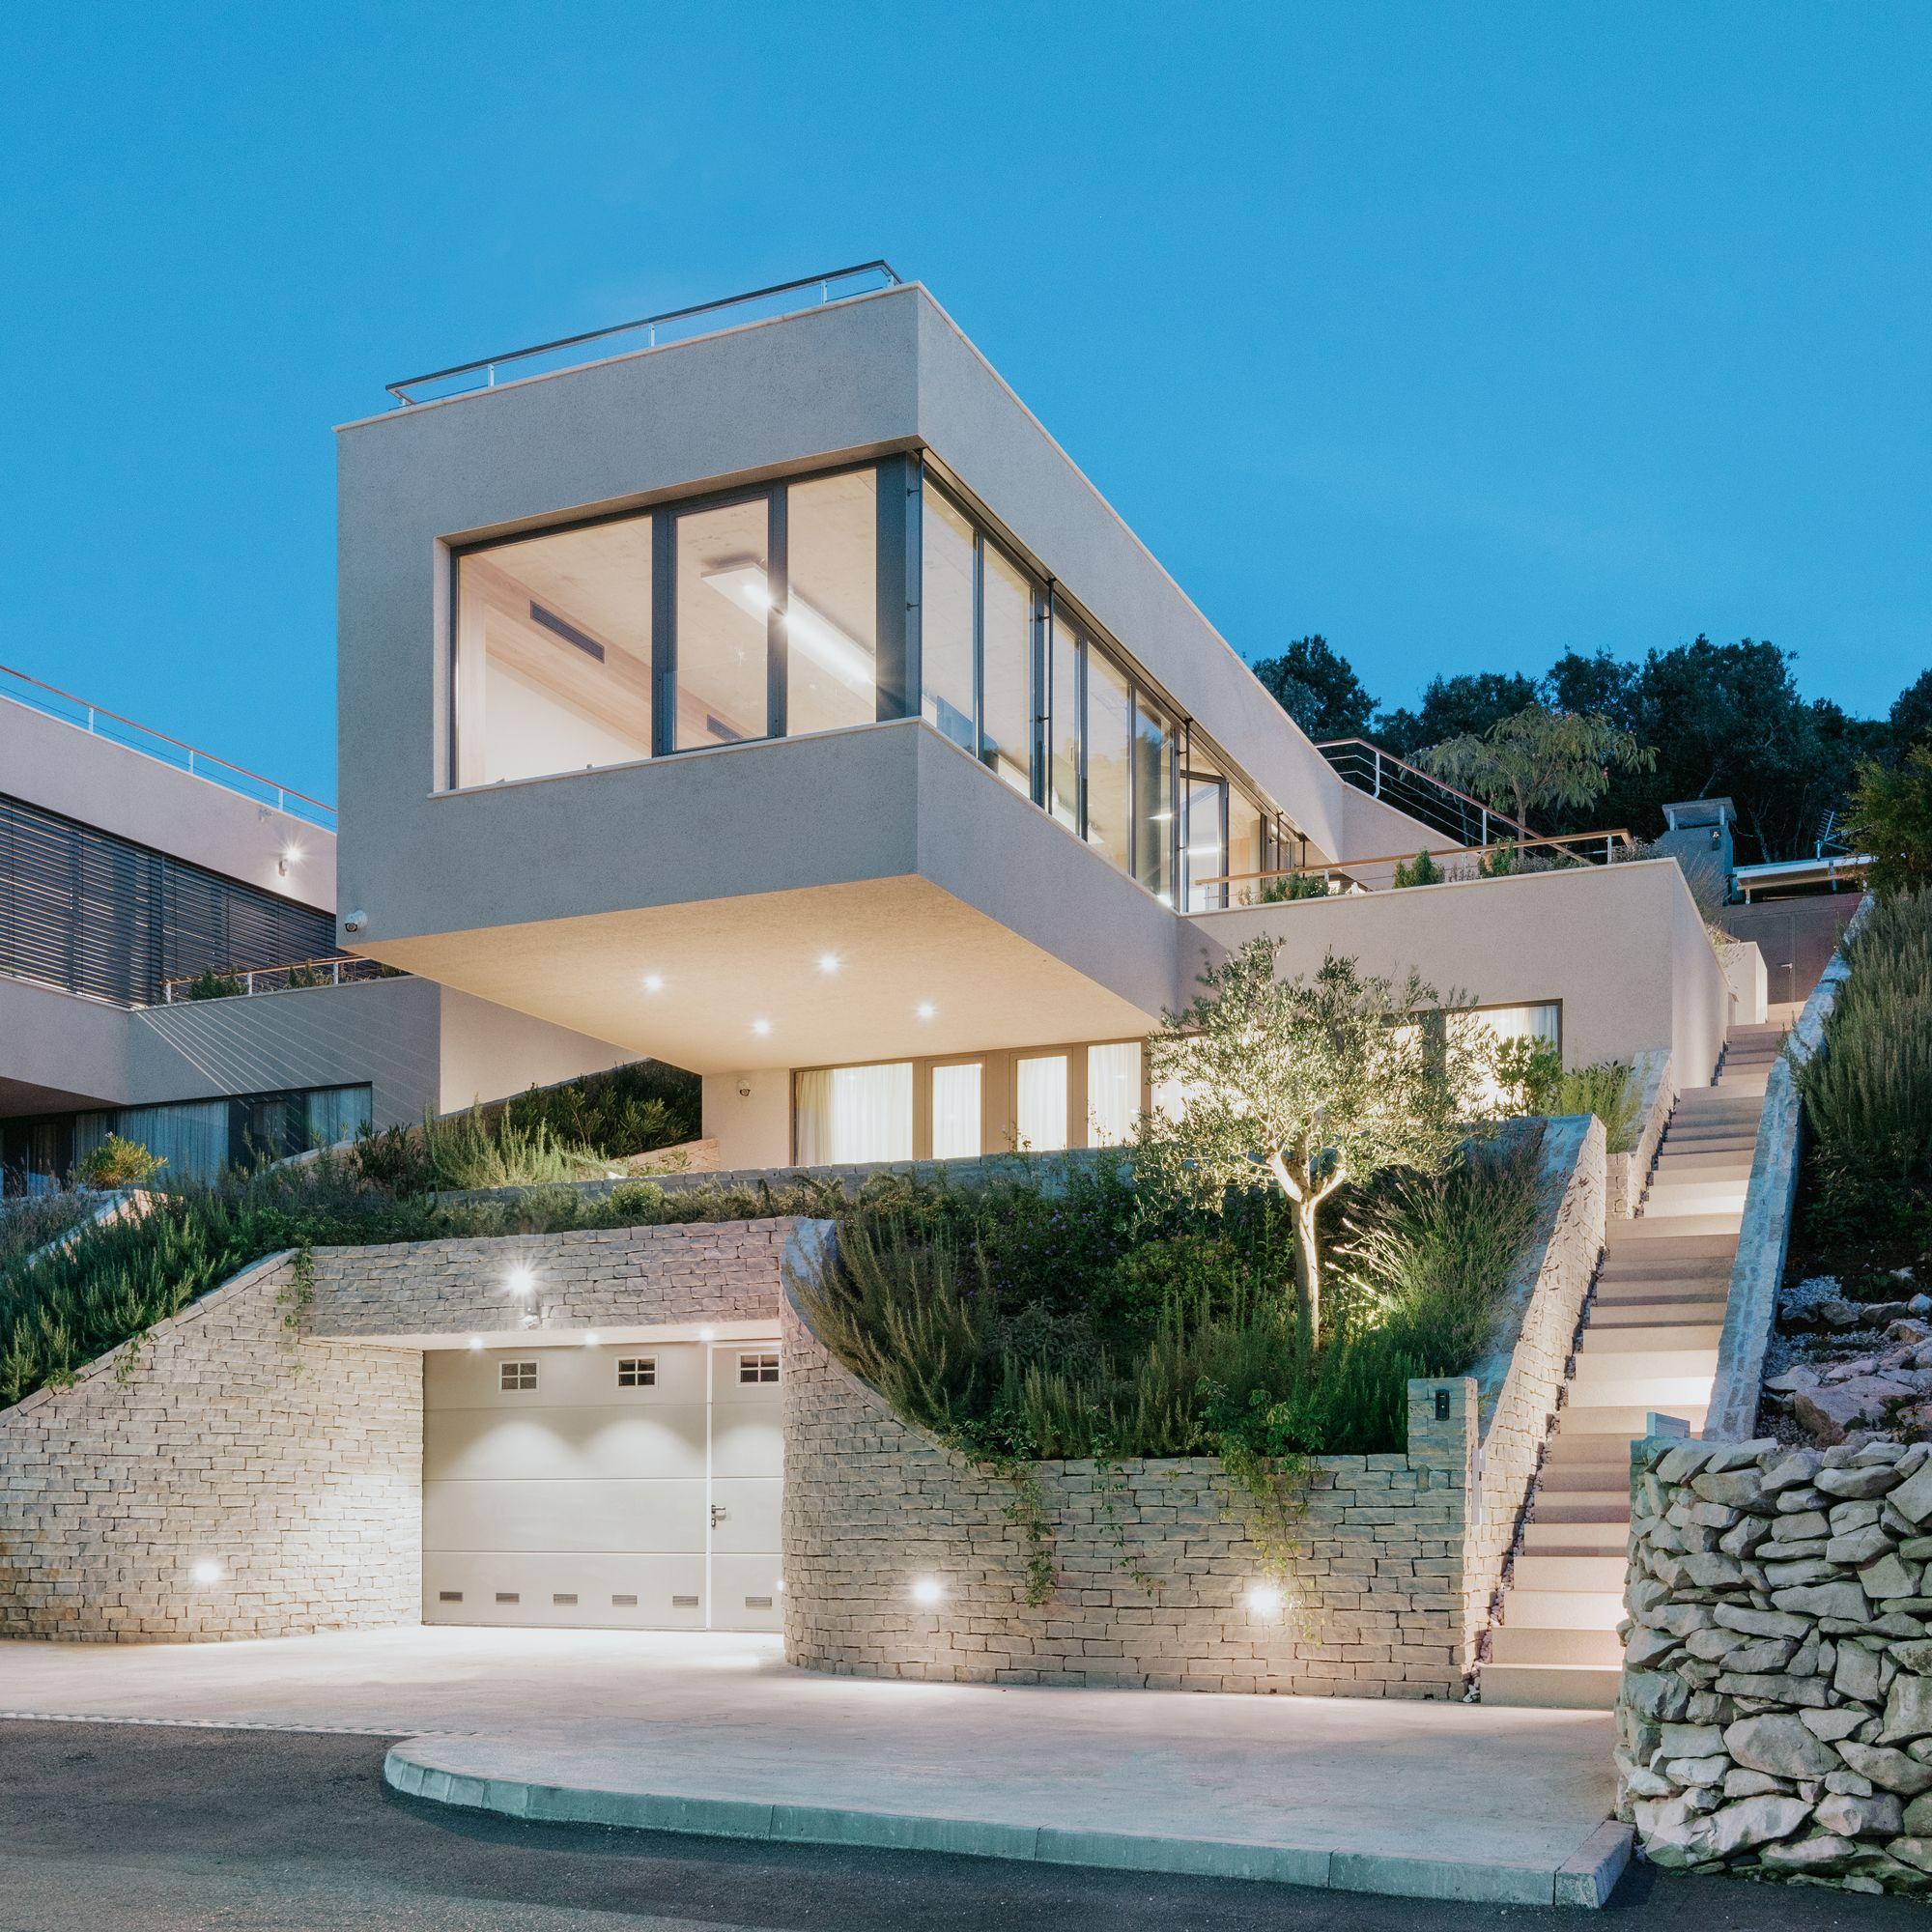 Gallery Of Tinel Vacation Houses Sodaarhitekti 26 In 2020 Dream House Exterior House Exterior House Architecture Design